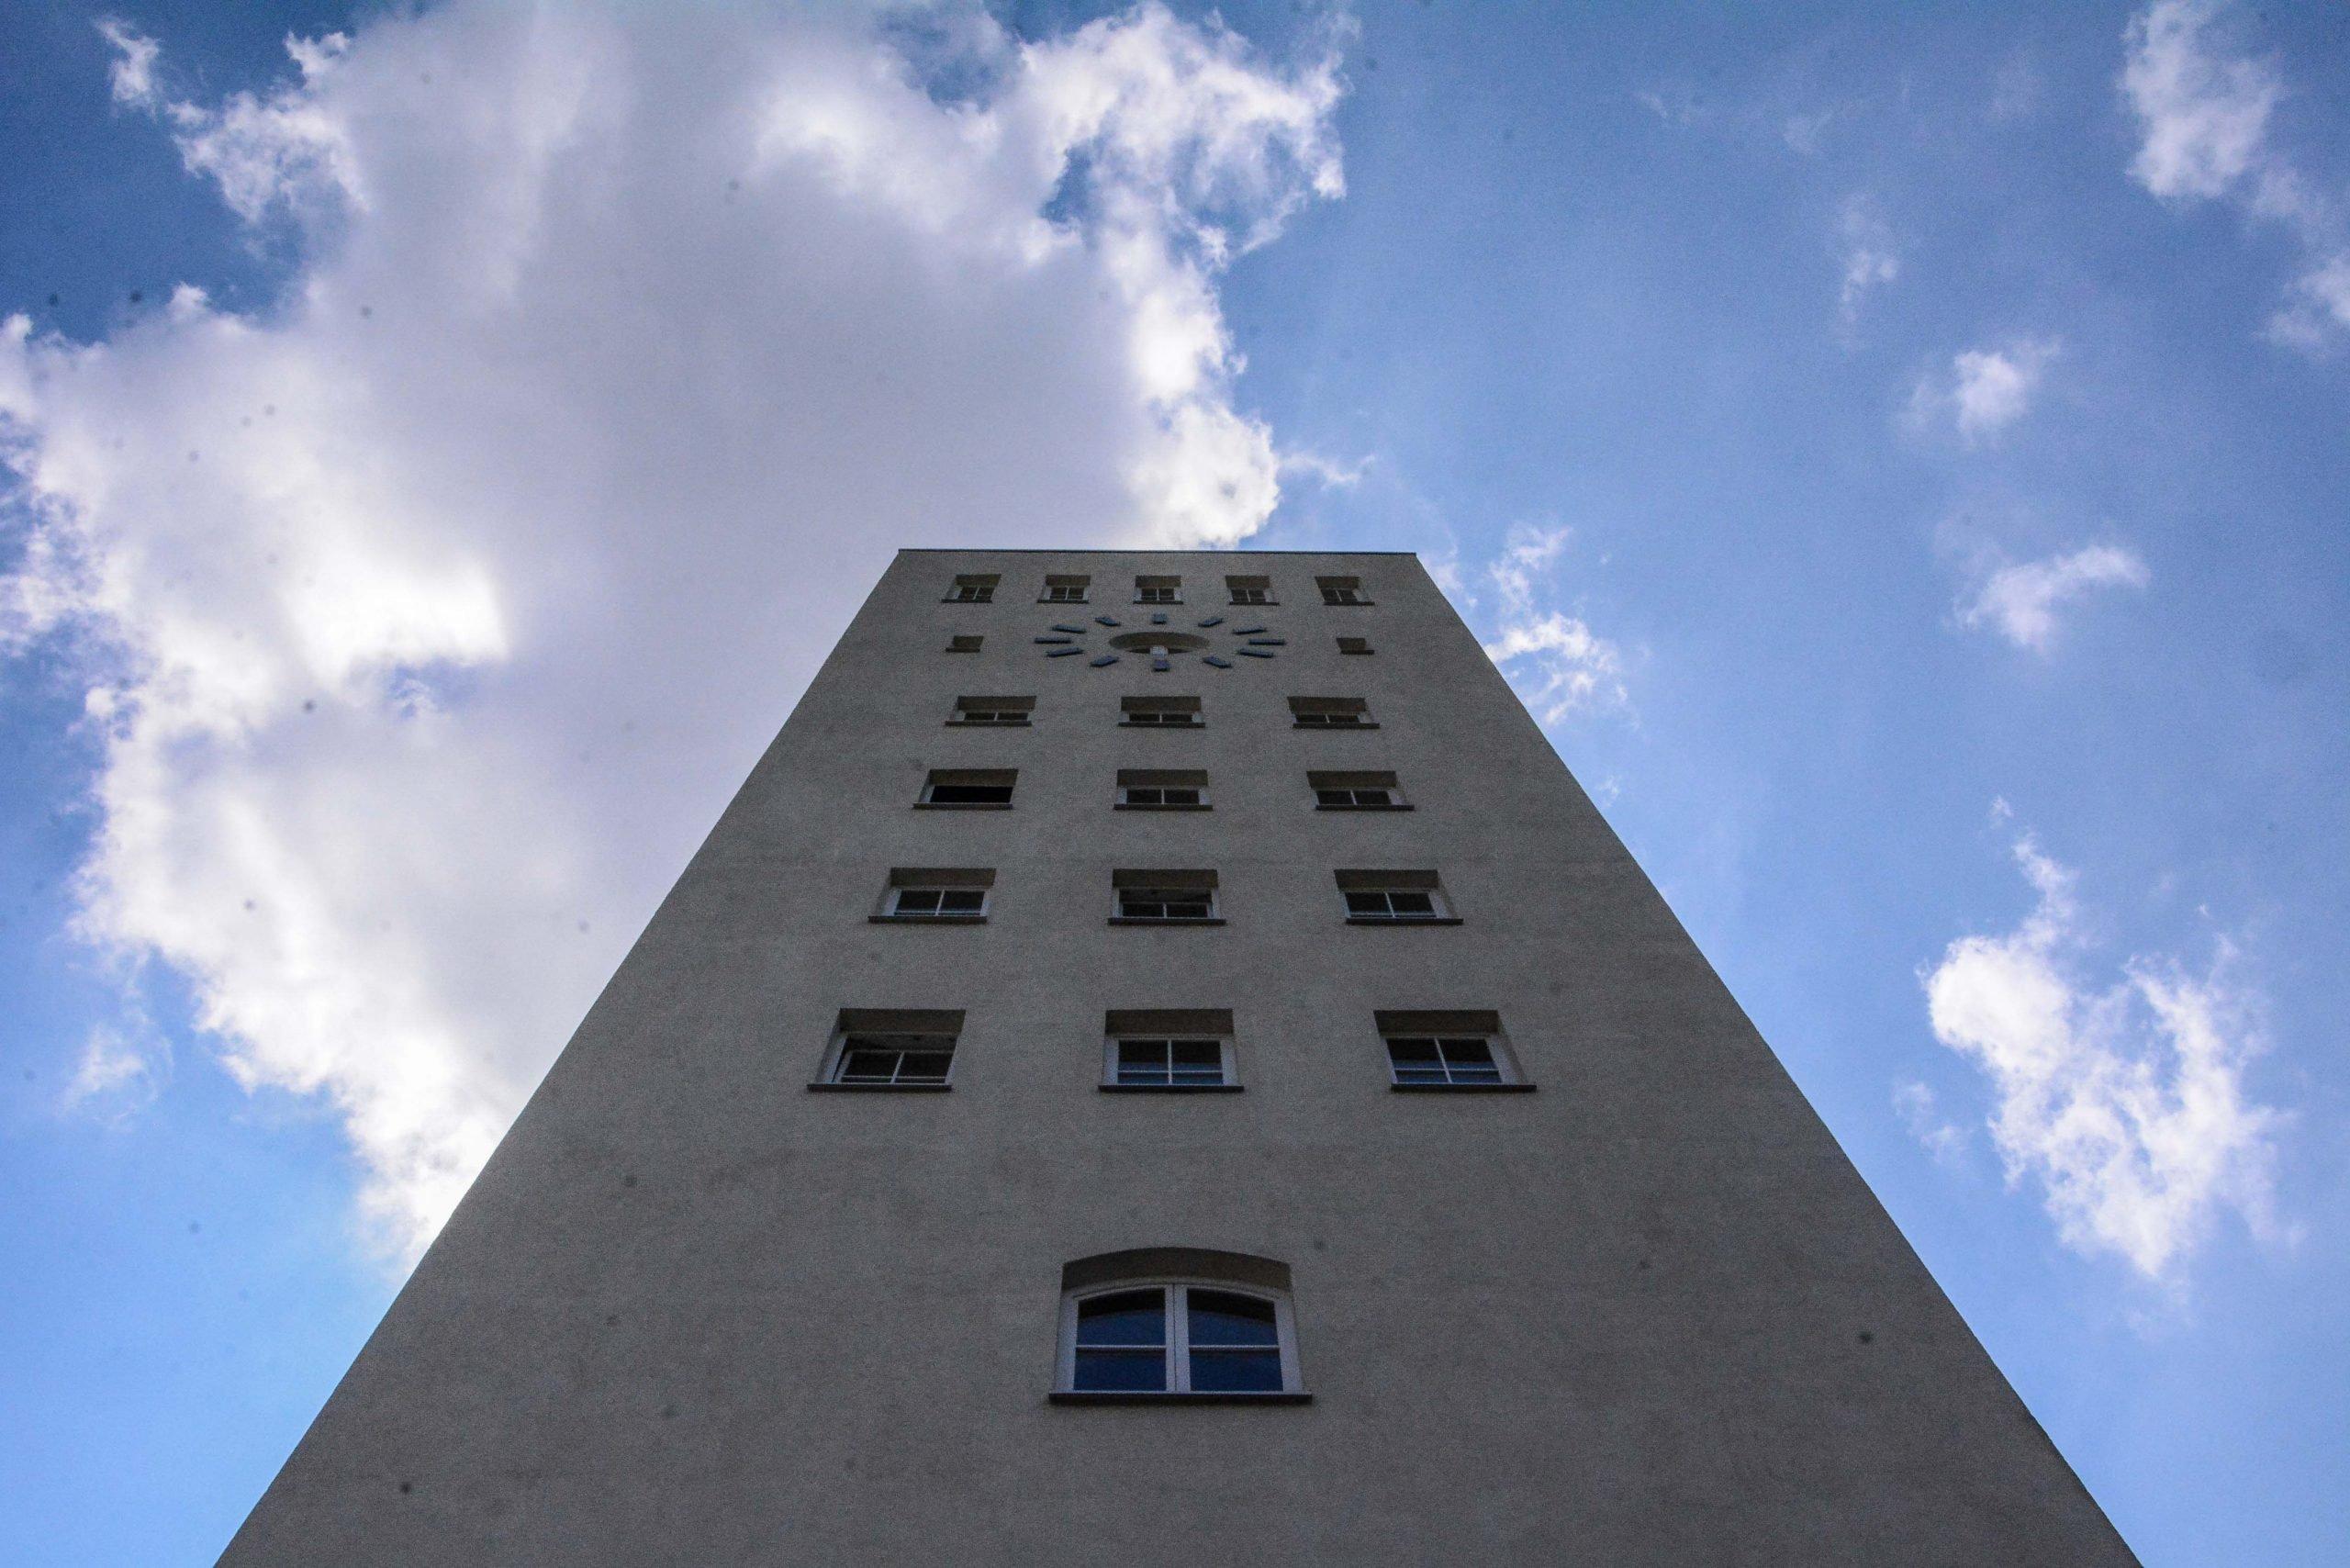 telefunken turm tower vierter ring four ring platz des 4 juli berlin hitler autobahn zehlendorf